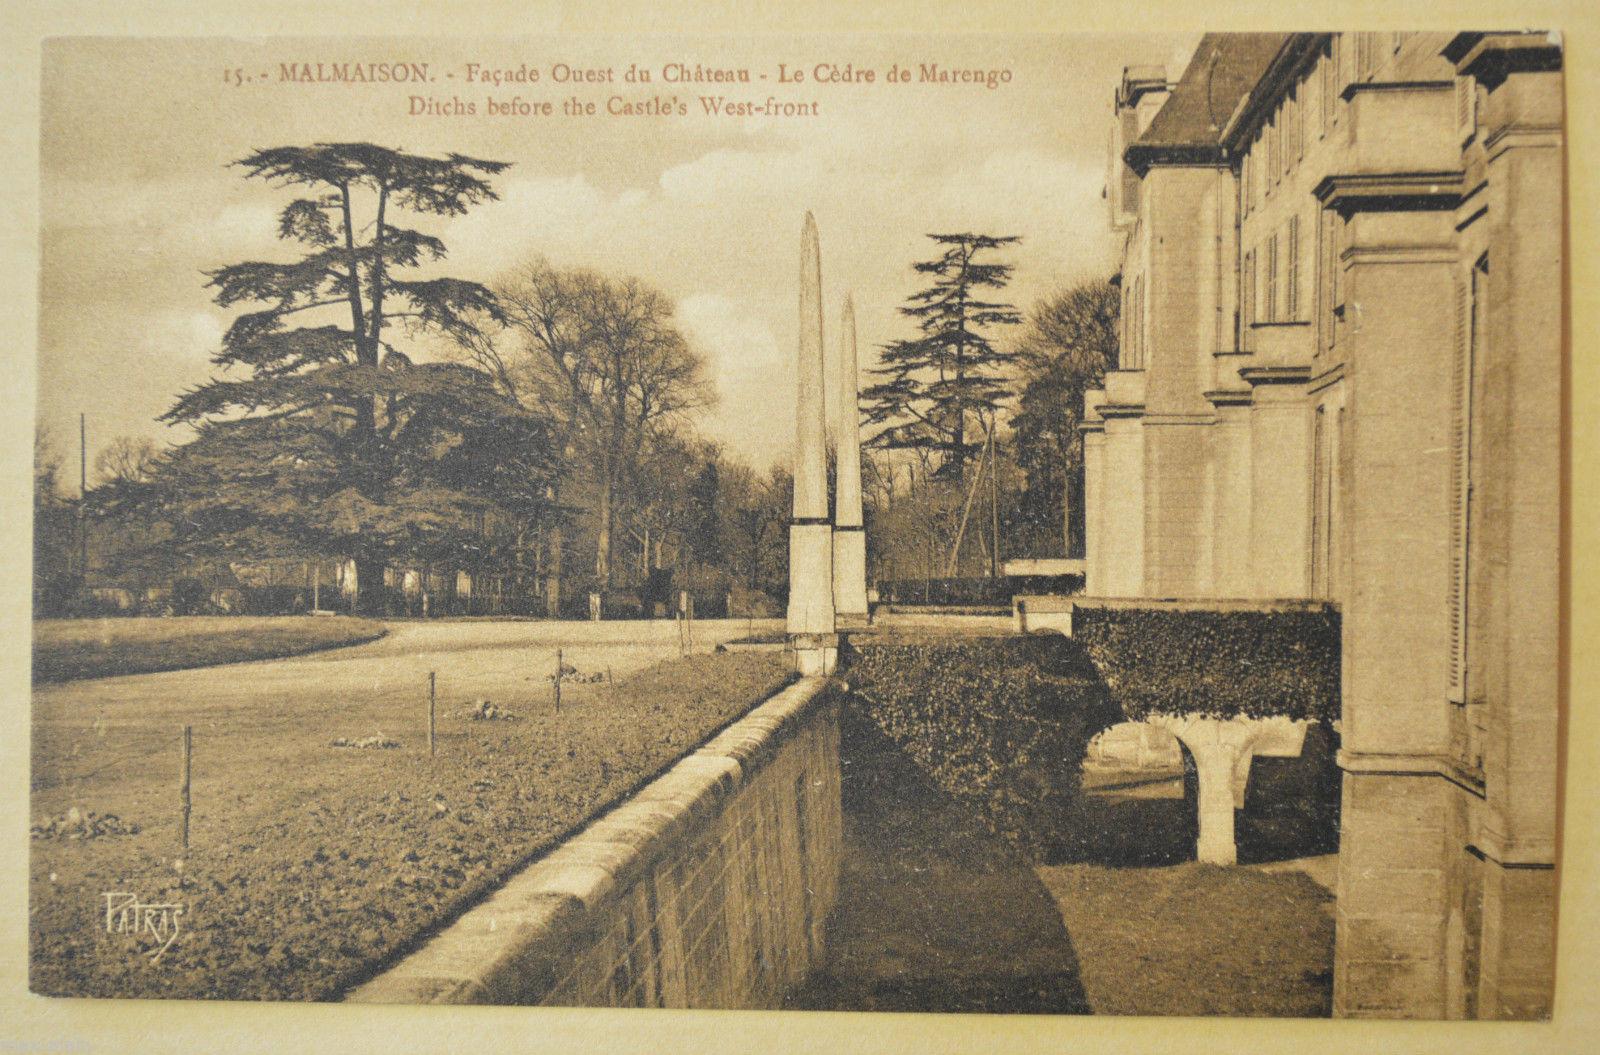 Cèdre de Marengo Rueil-Malmaison, Jean Luard (8)